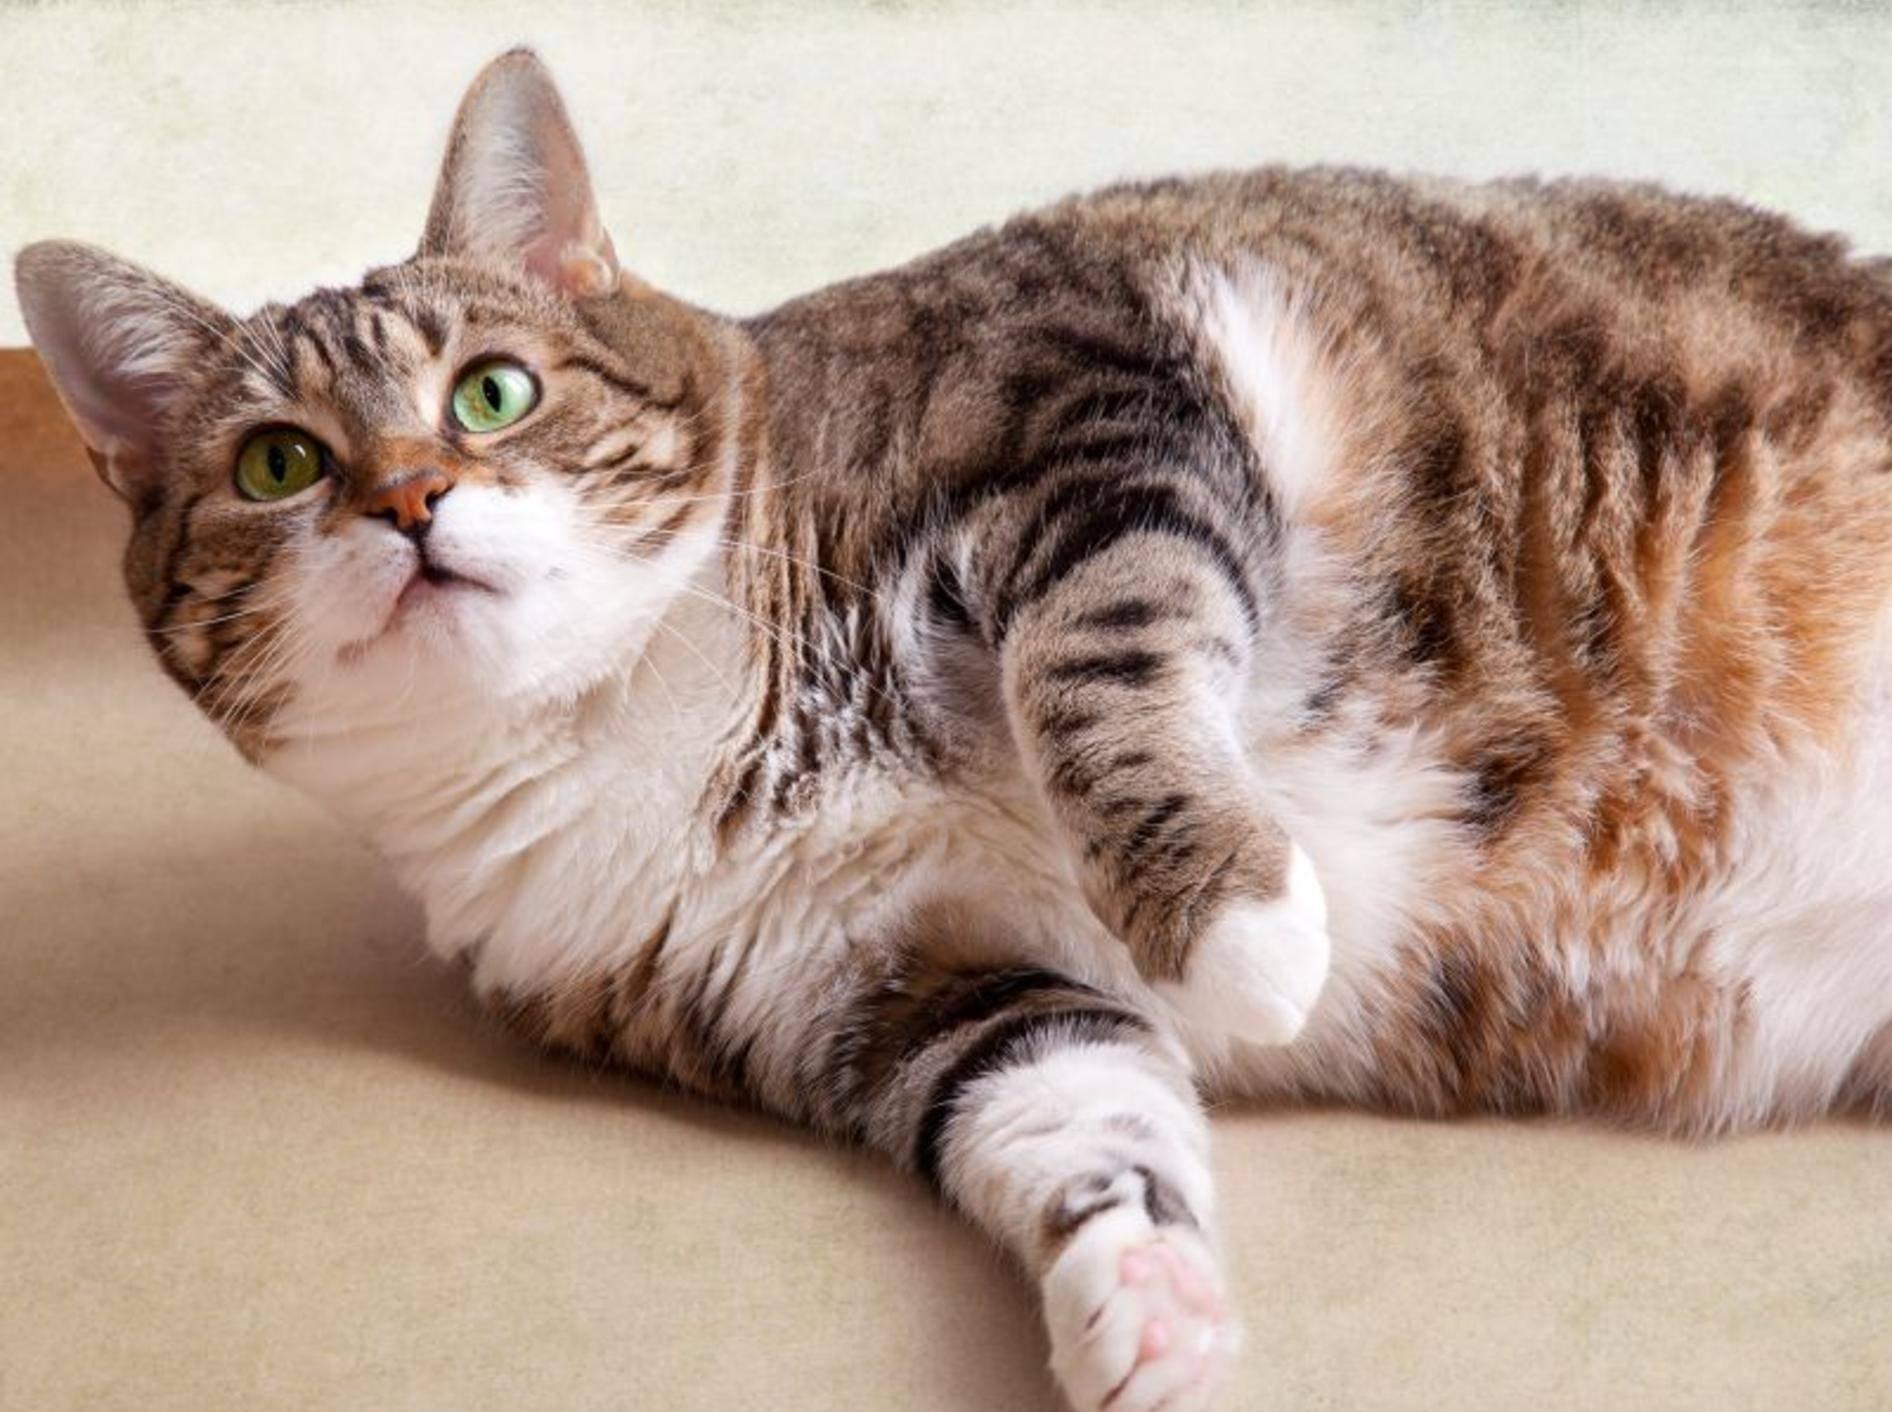 Dickes Fell oder dicke Katze? – Bild: Shutterstock / Nailia Schwarz